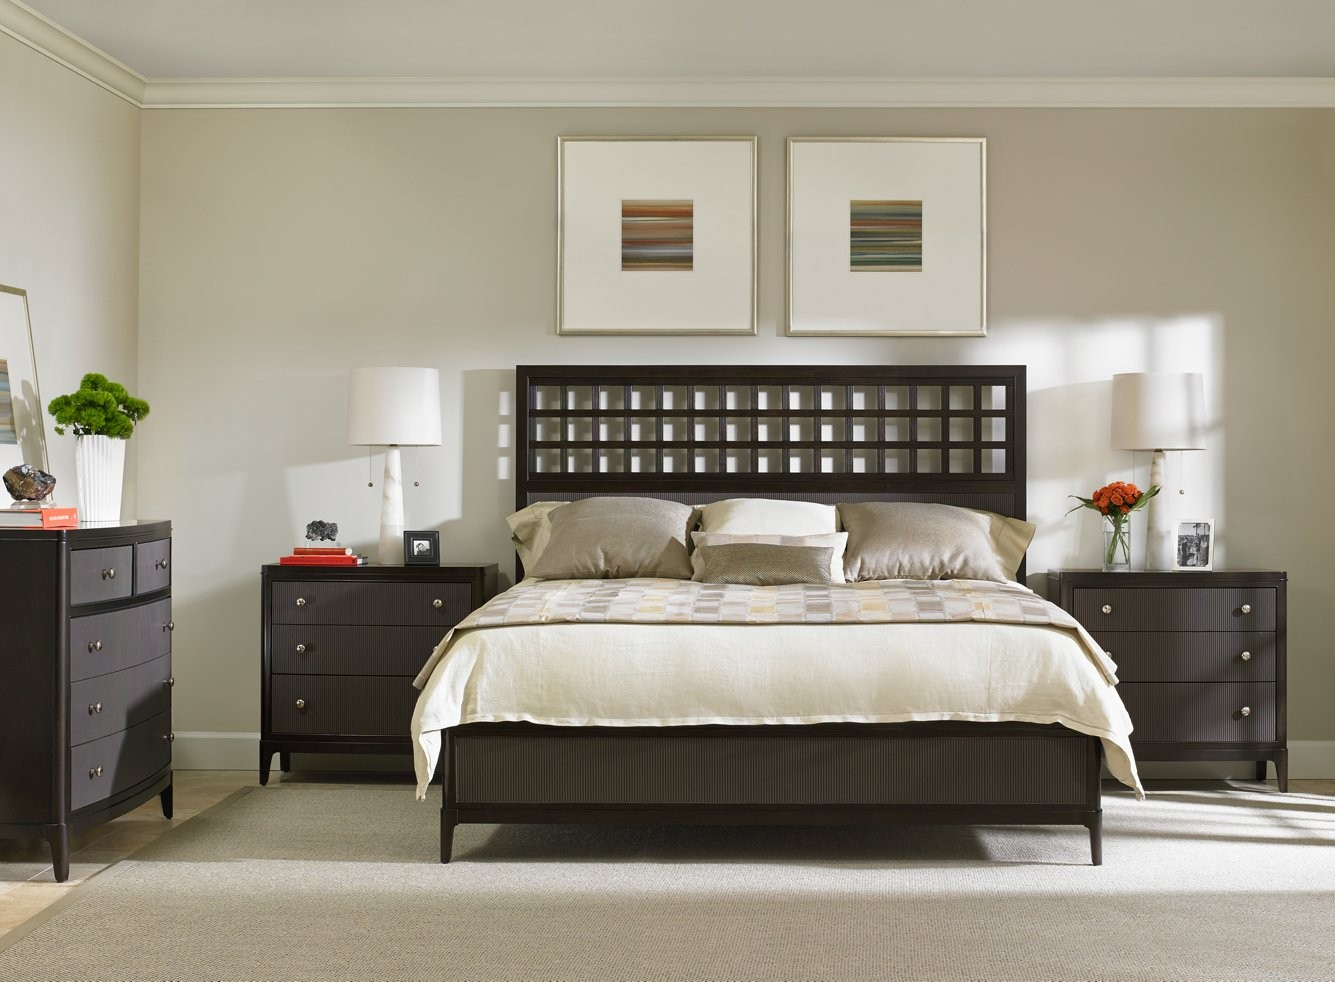 Stanley Furniture Wicker Park Wood Panel Bed In Brownstone 409 13 4